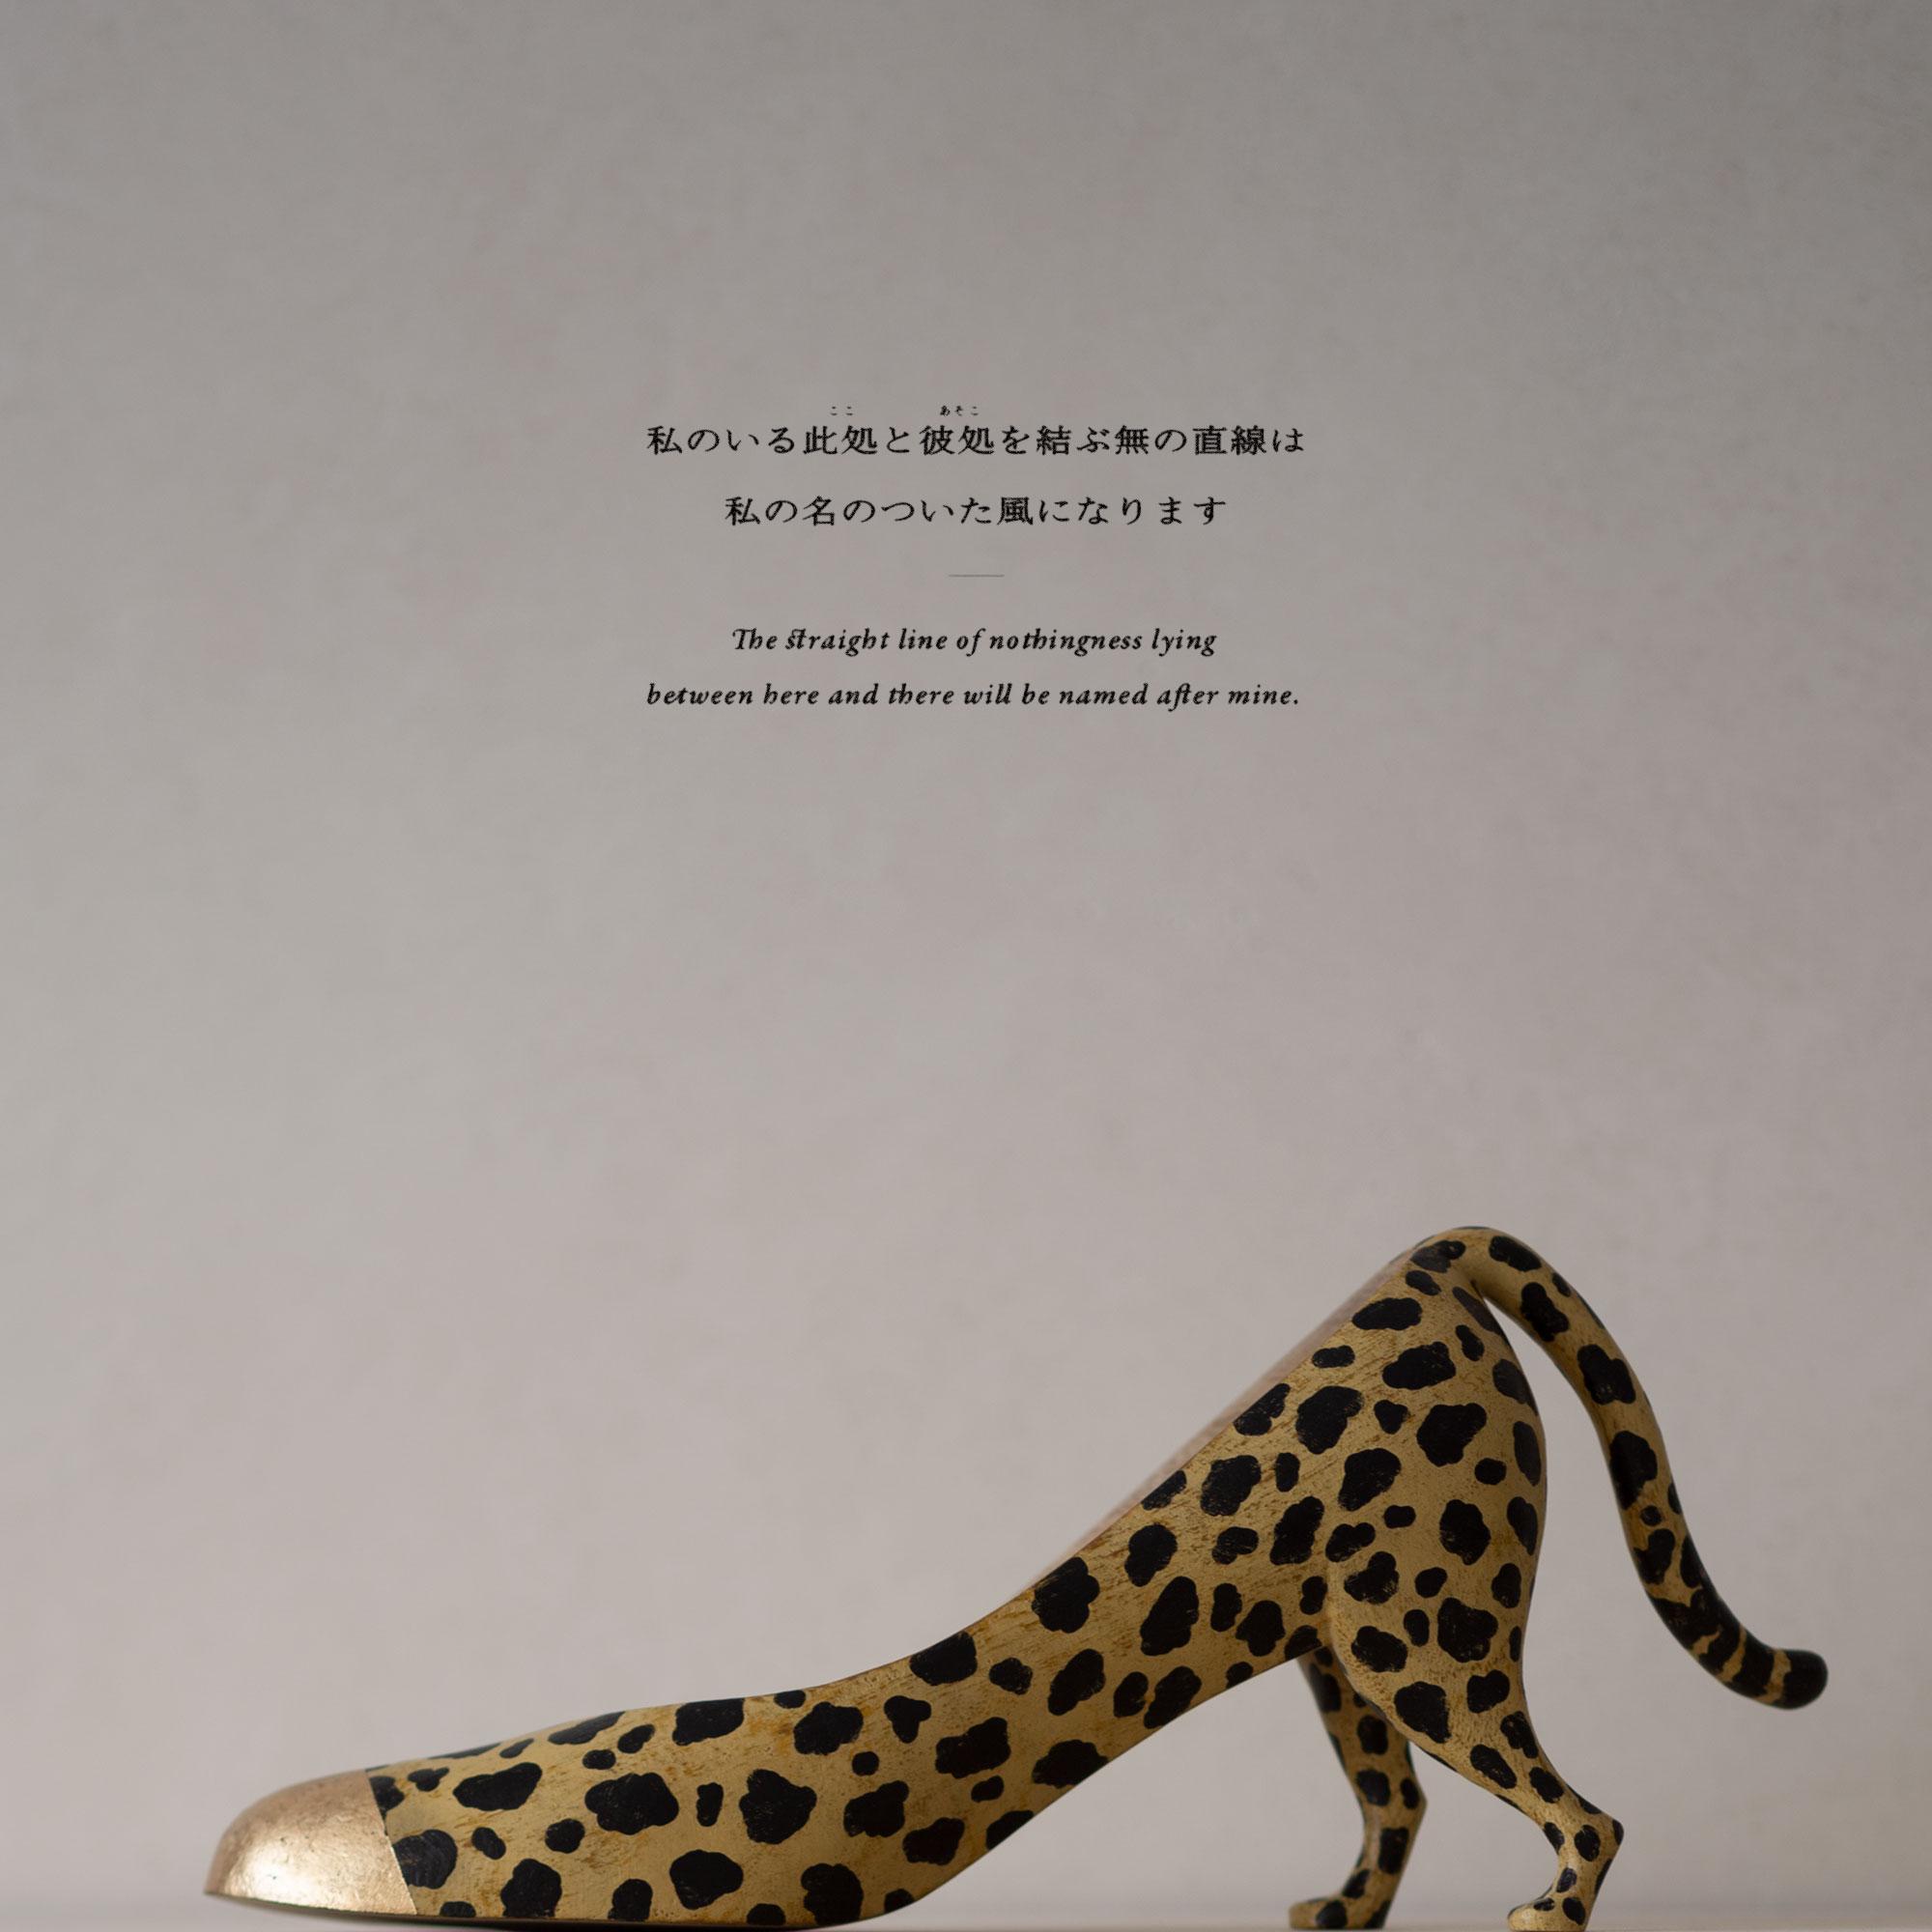 "Yuta NISHIURA ""動 Motion"" #03 Mar. 2020 「私のいる此処と彼処を結ぶ無の直線は 私の名のついた風になります」"